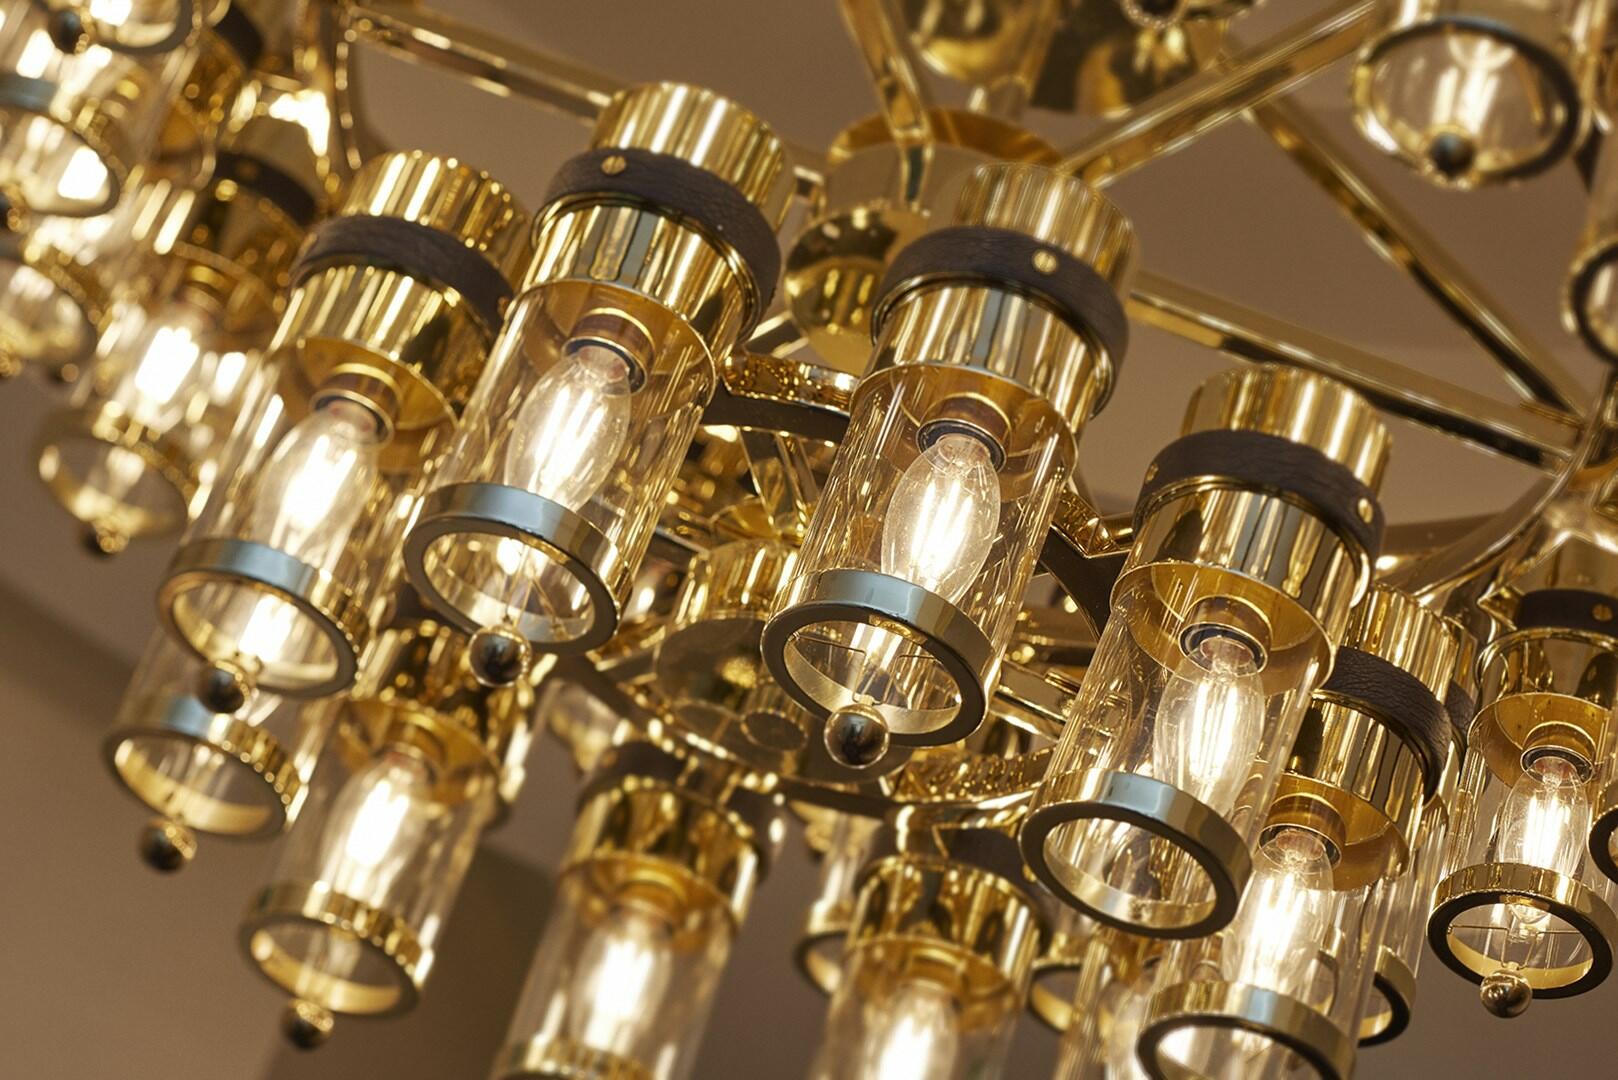 Stylish lampshades at Crown Hotel Perth